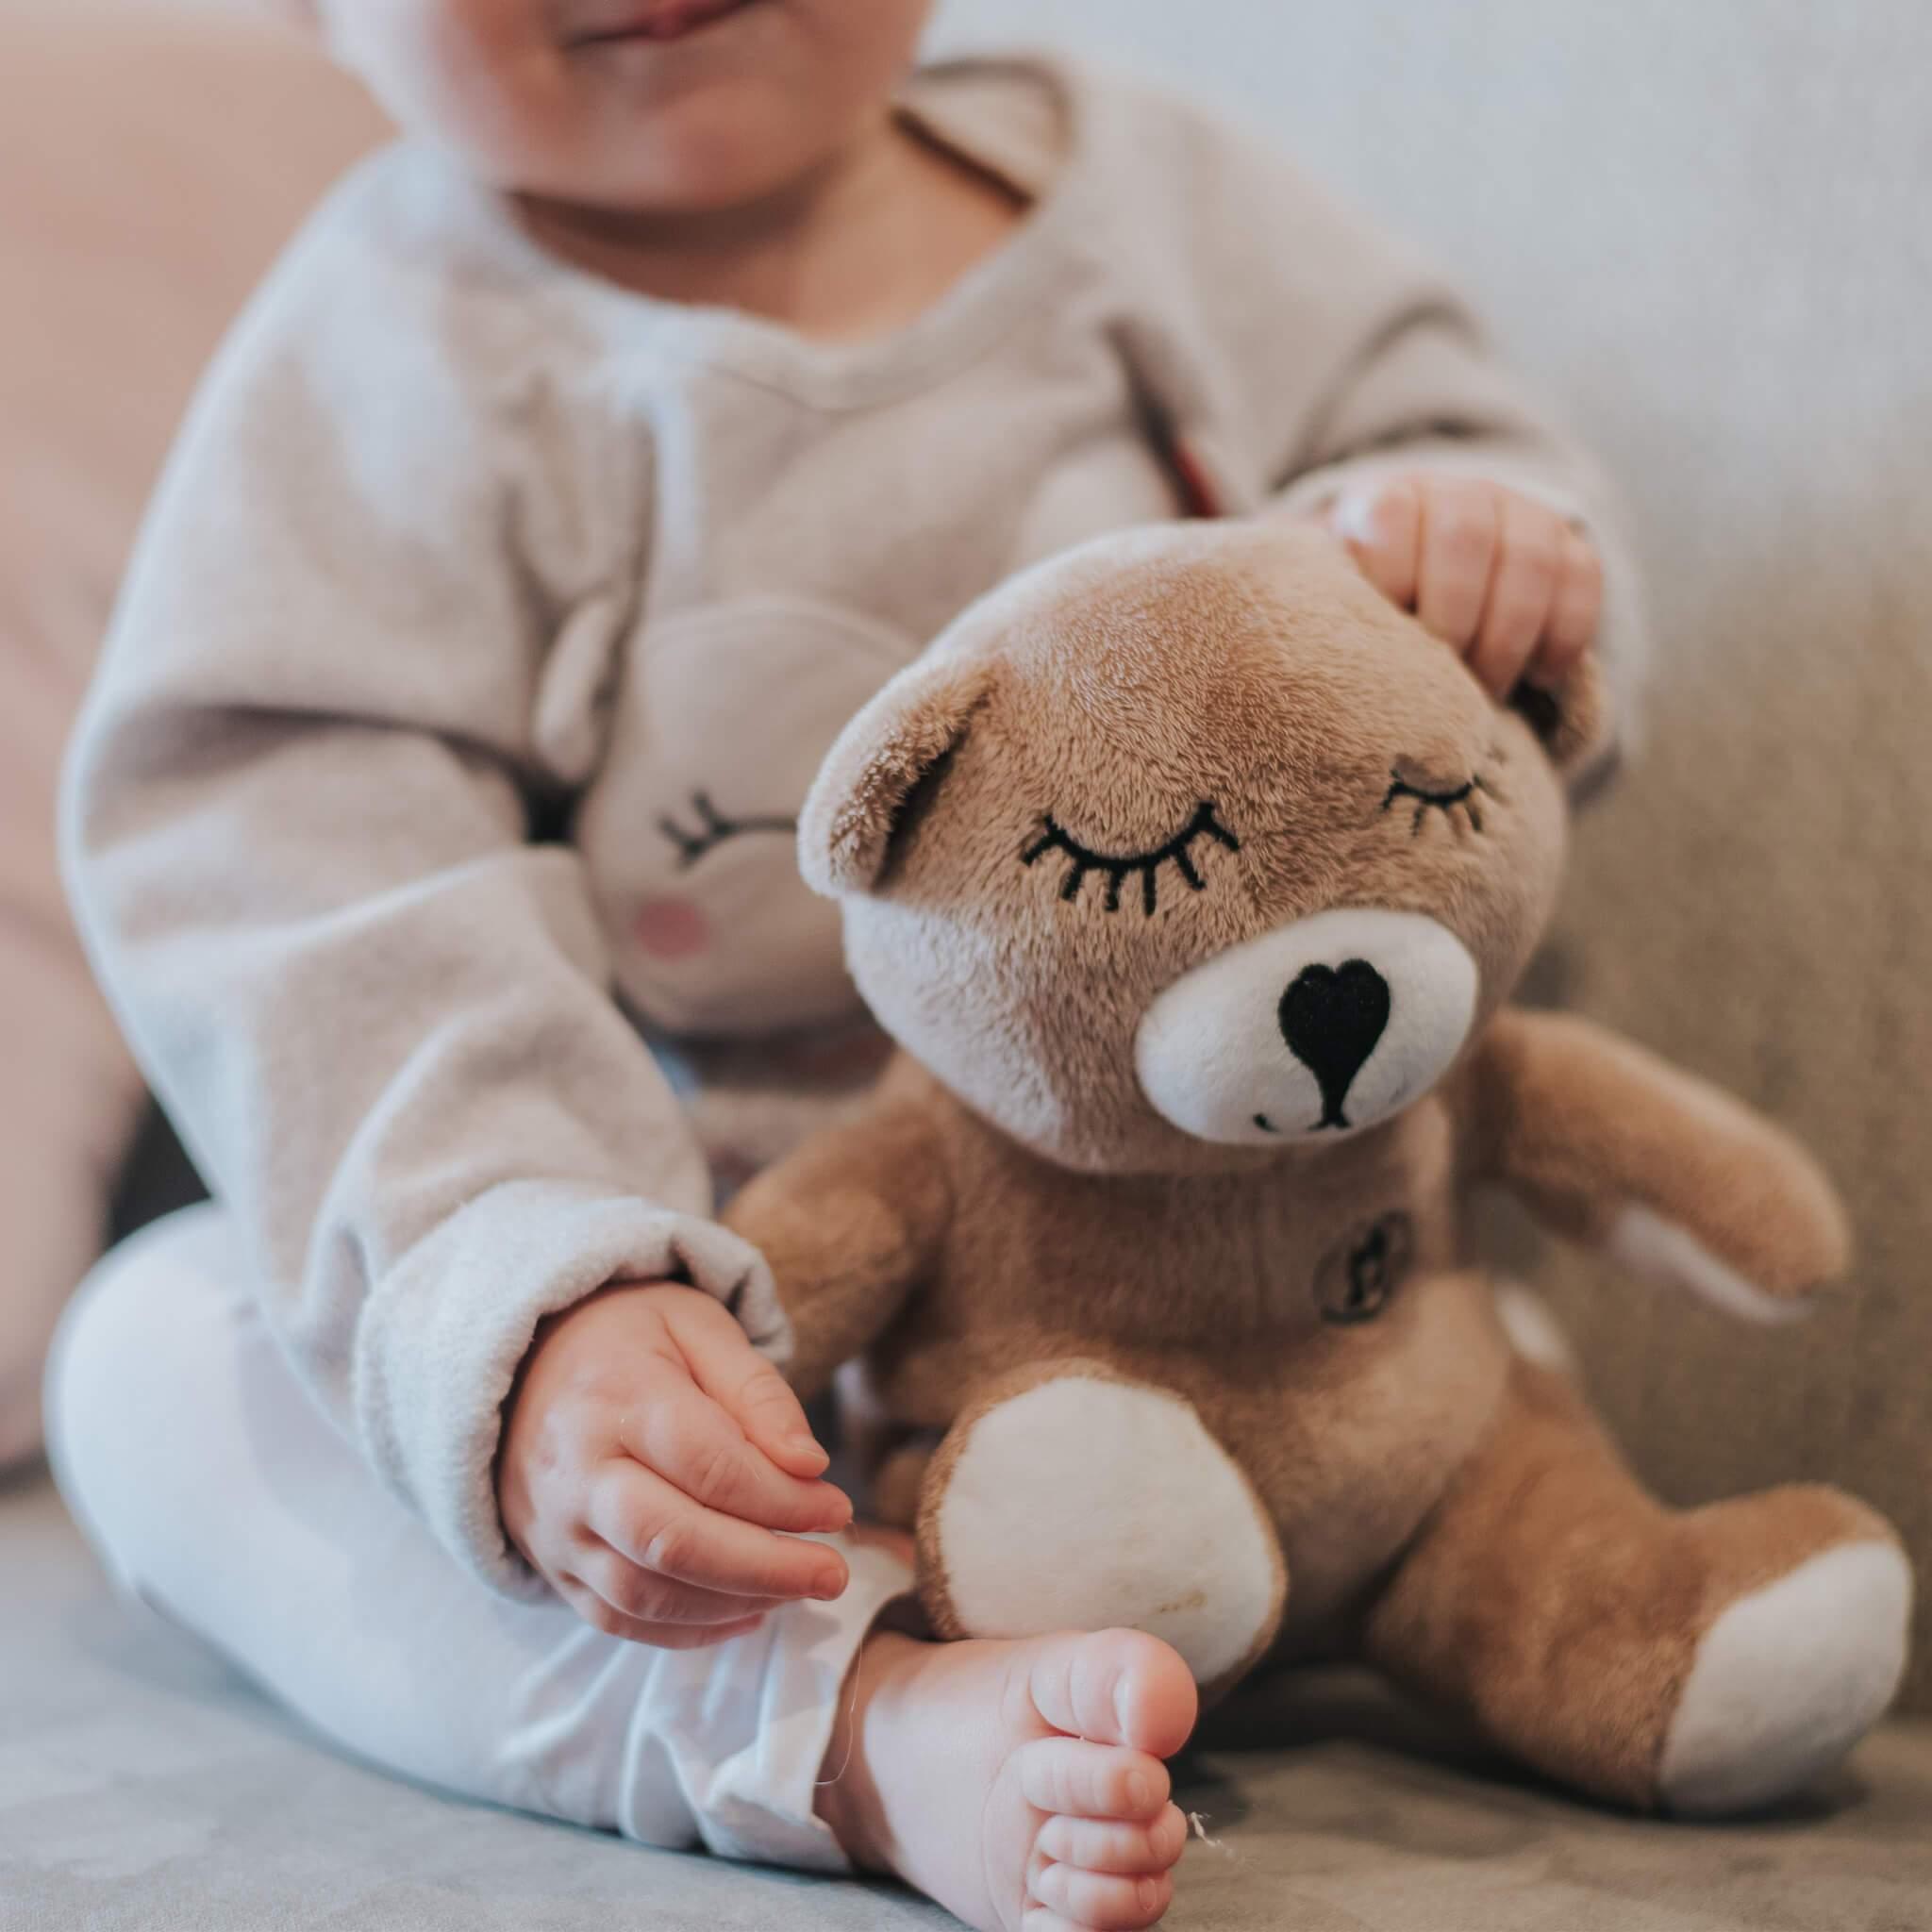 Cliquez ici pour acheter Moka musical teddy bear